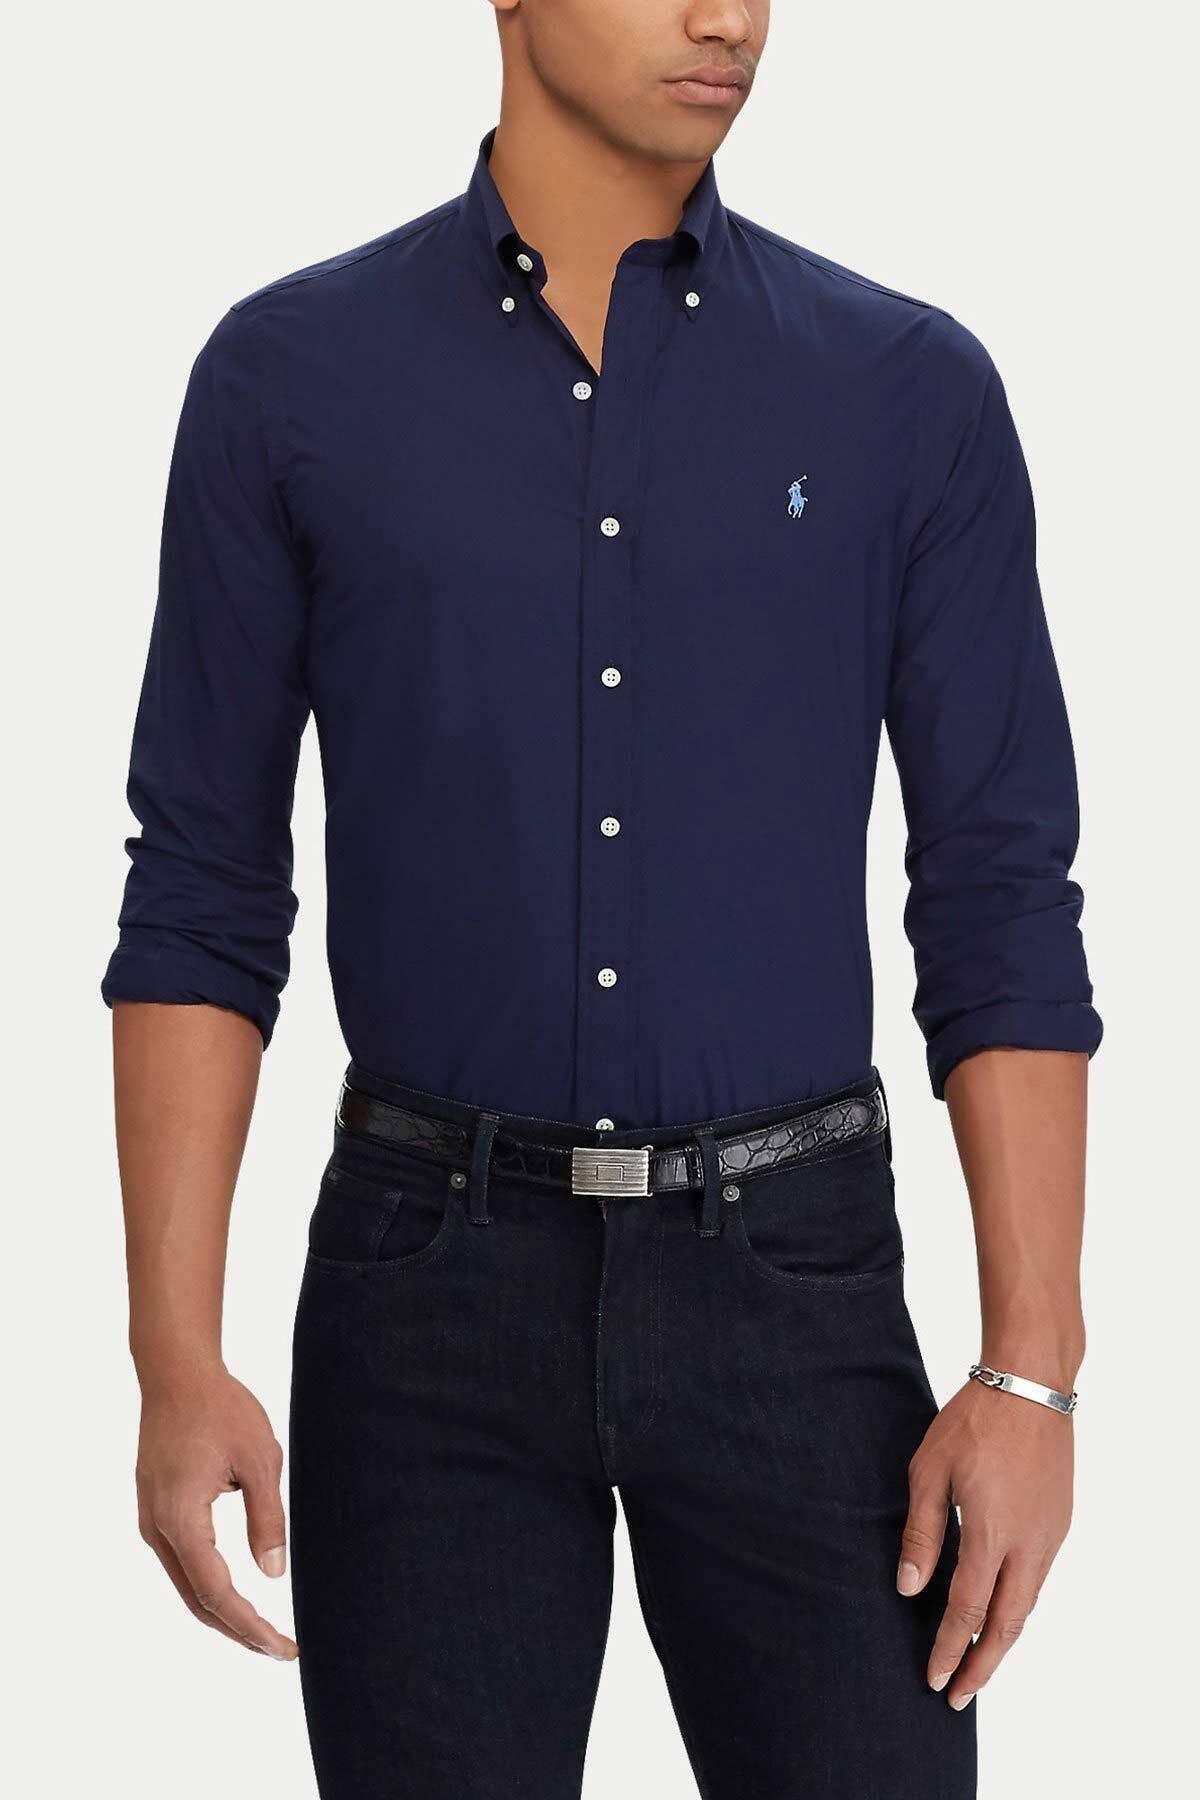 Polo Ralph Lauren Erkek Lacivert Slim Fit %100 Pamuk Stretch Gömlek 1